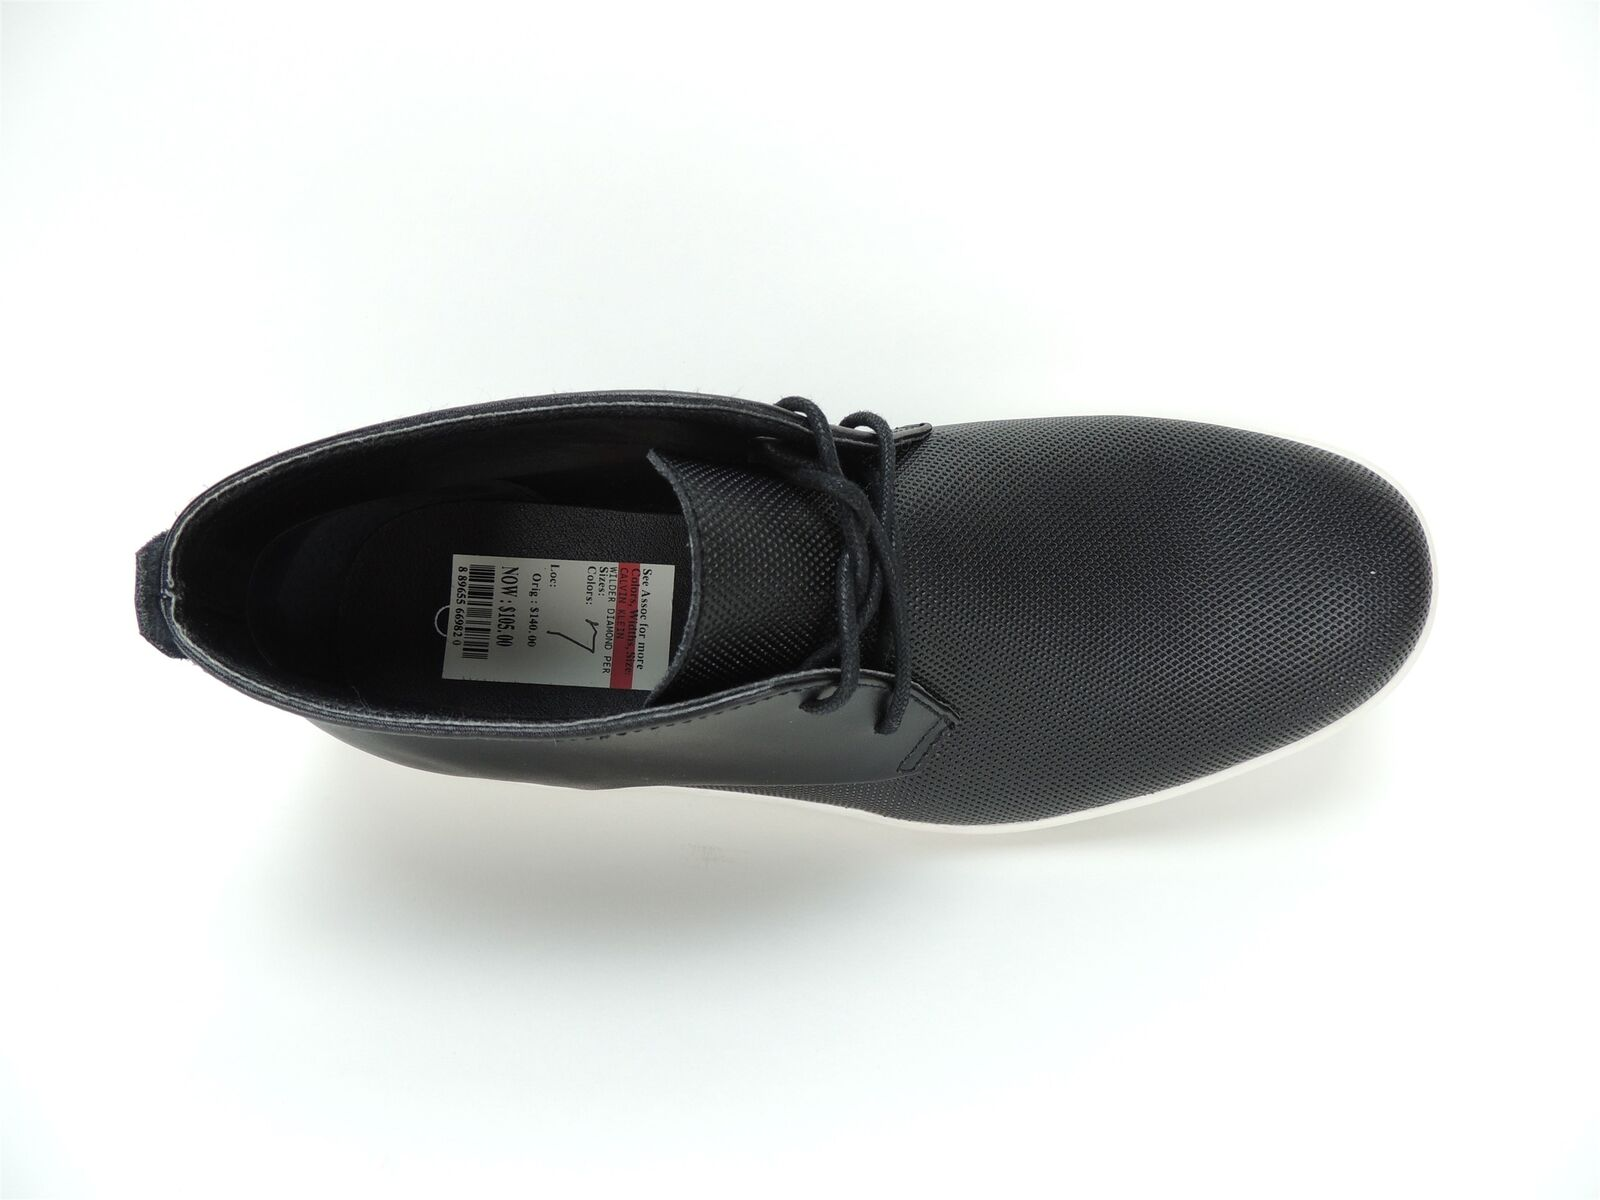 0d7899feca6 Calvin Klein Men's Wilder Diamond Leather Chukka Boots Black Size ...